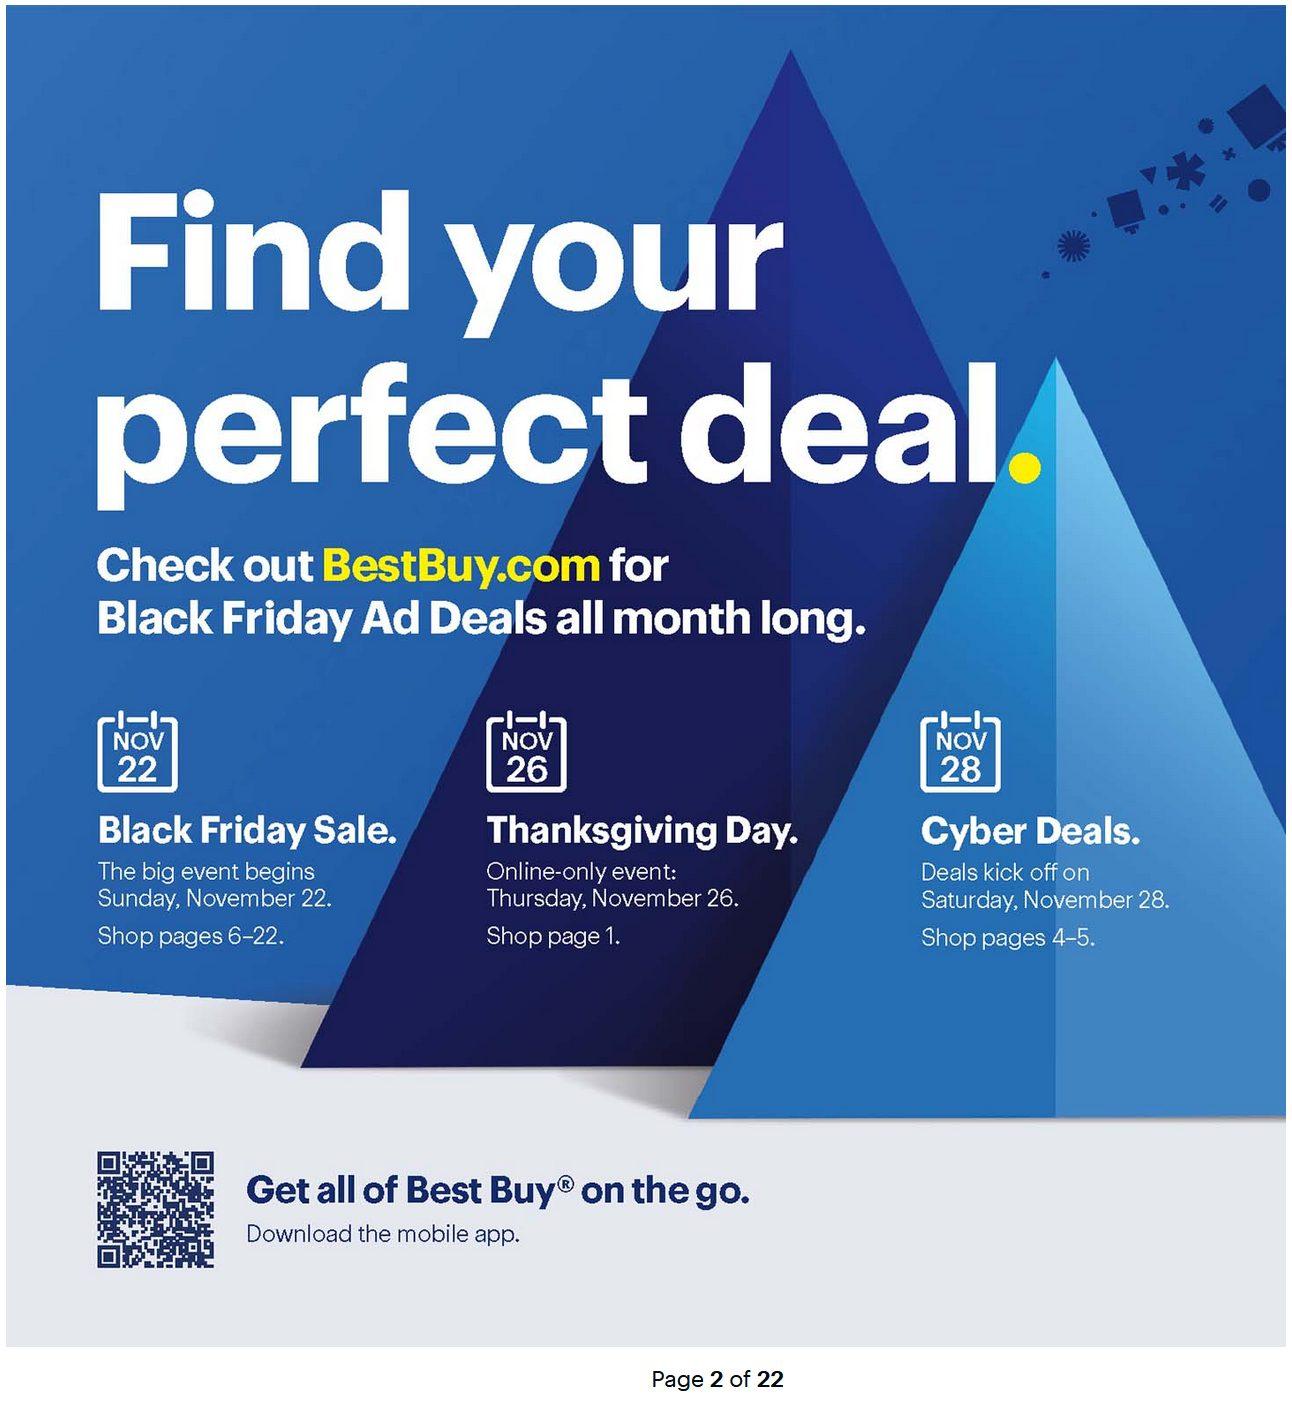 Best Buy Black Friday 2020 Ad